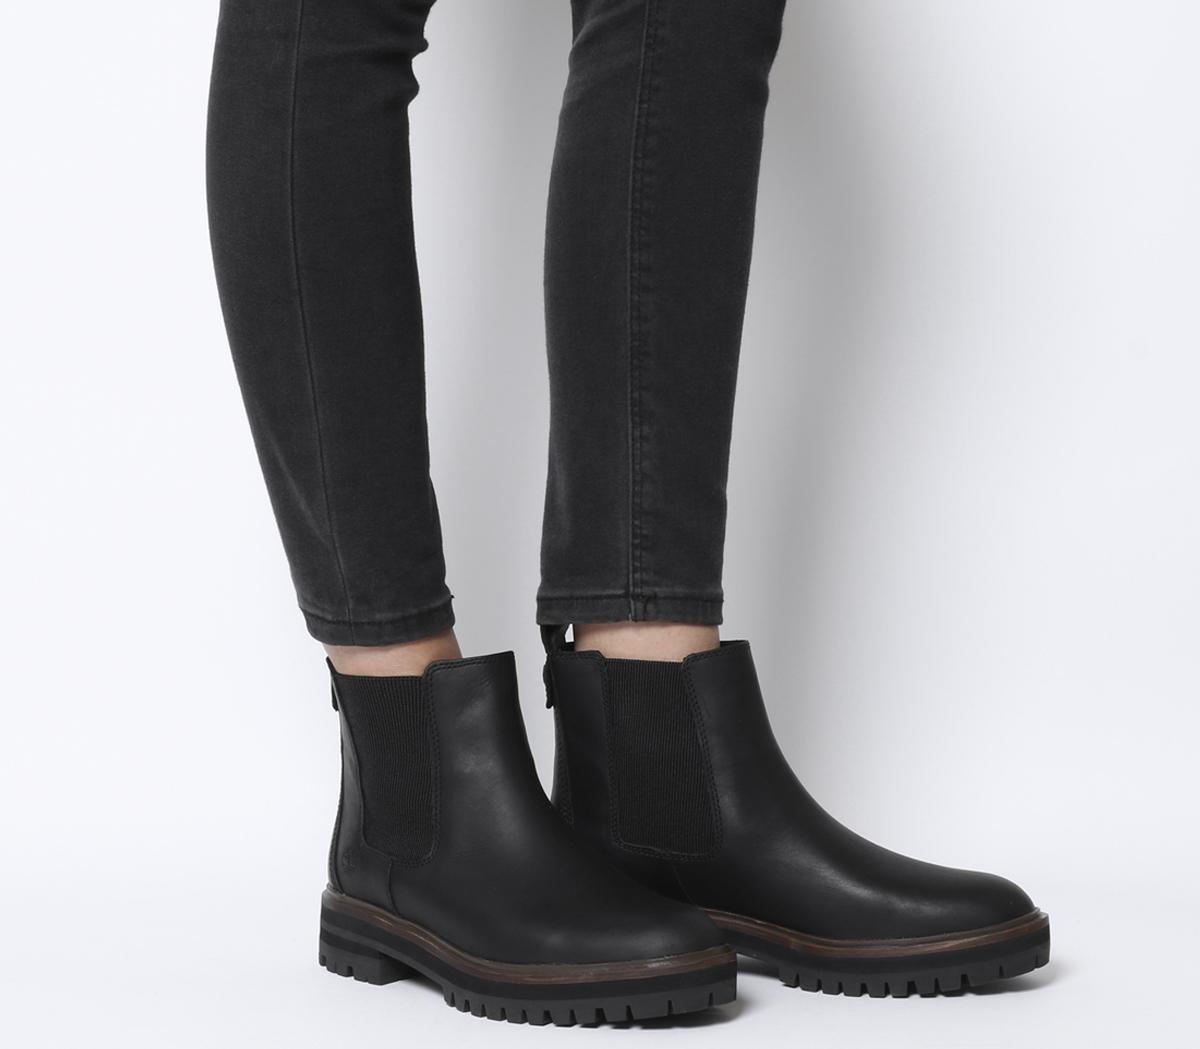 London Square Chelsea Boots